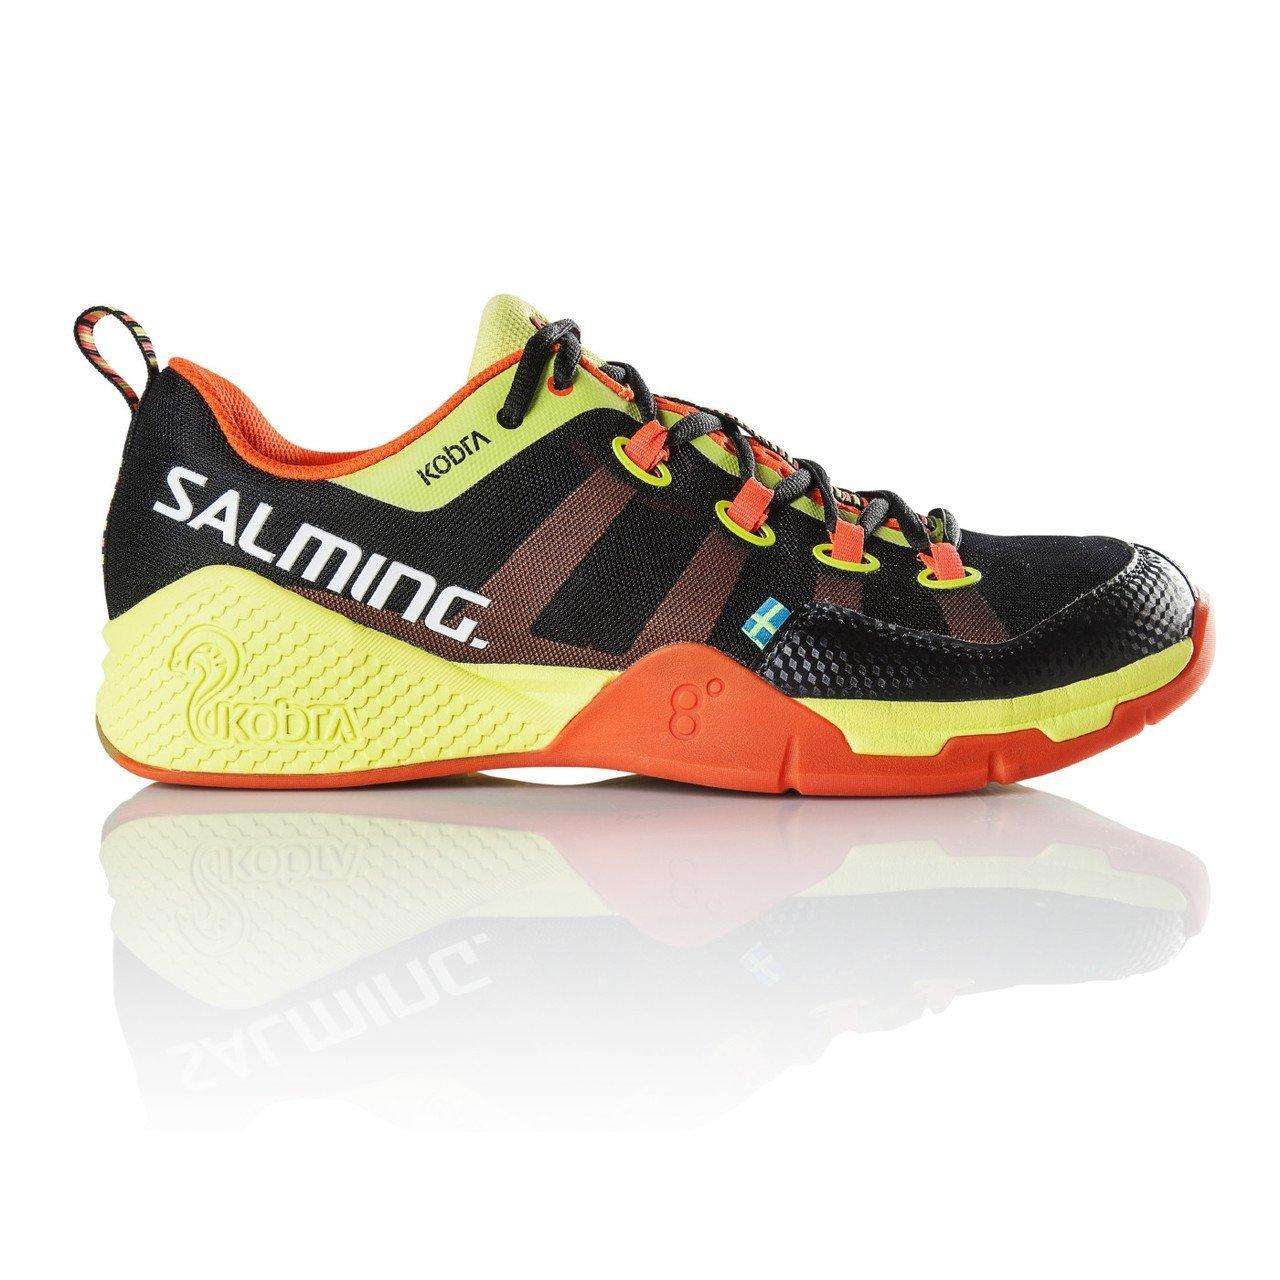 Salming Kobra Mens Squash Shoes (11, Black/Orange)